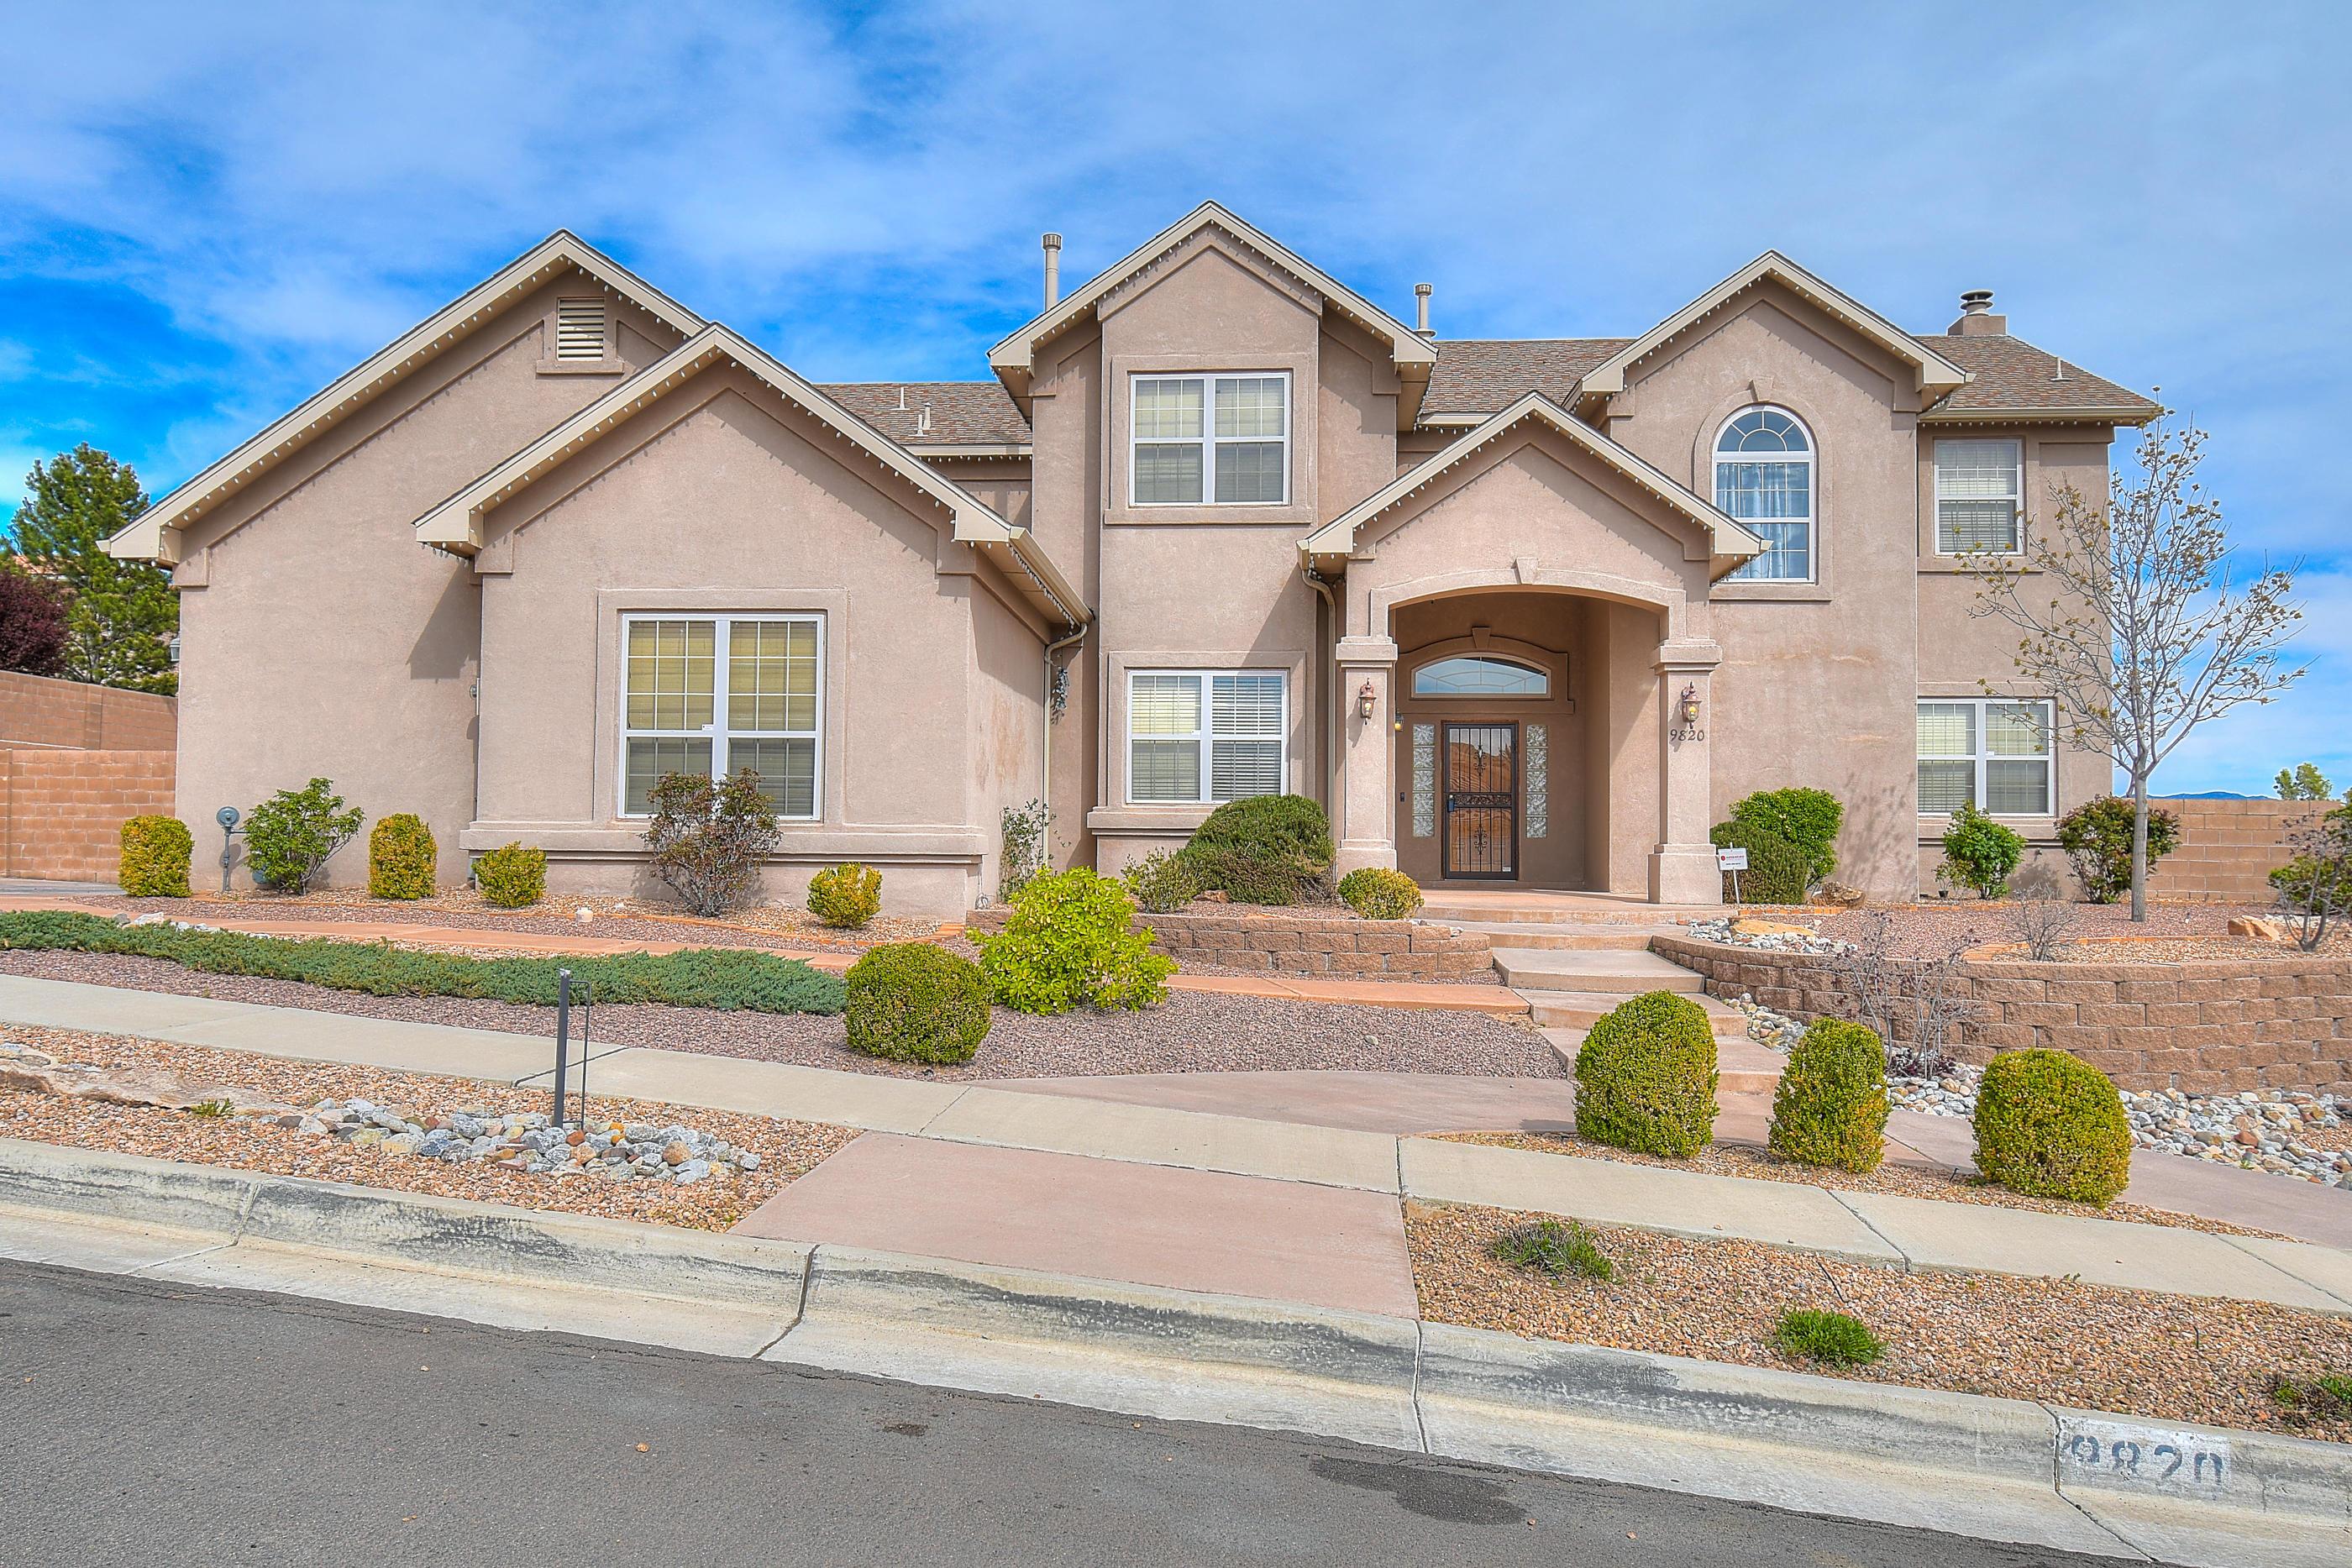 9820 NW Stone Street, Northwest Albuquerque and Northwest Heights, New Mexico